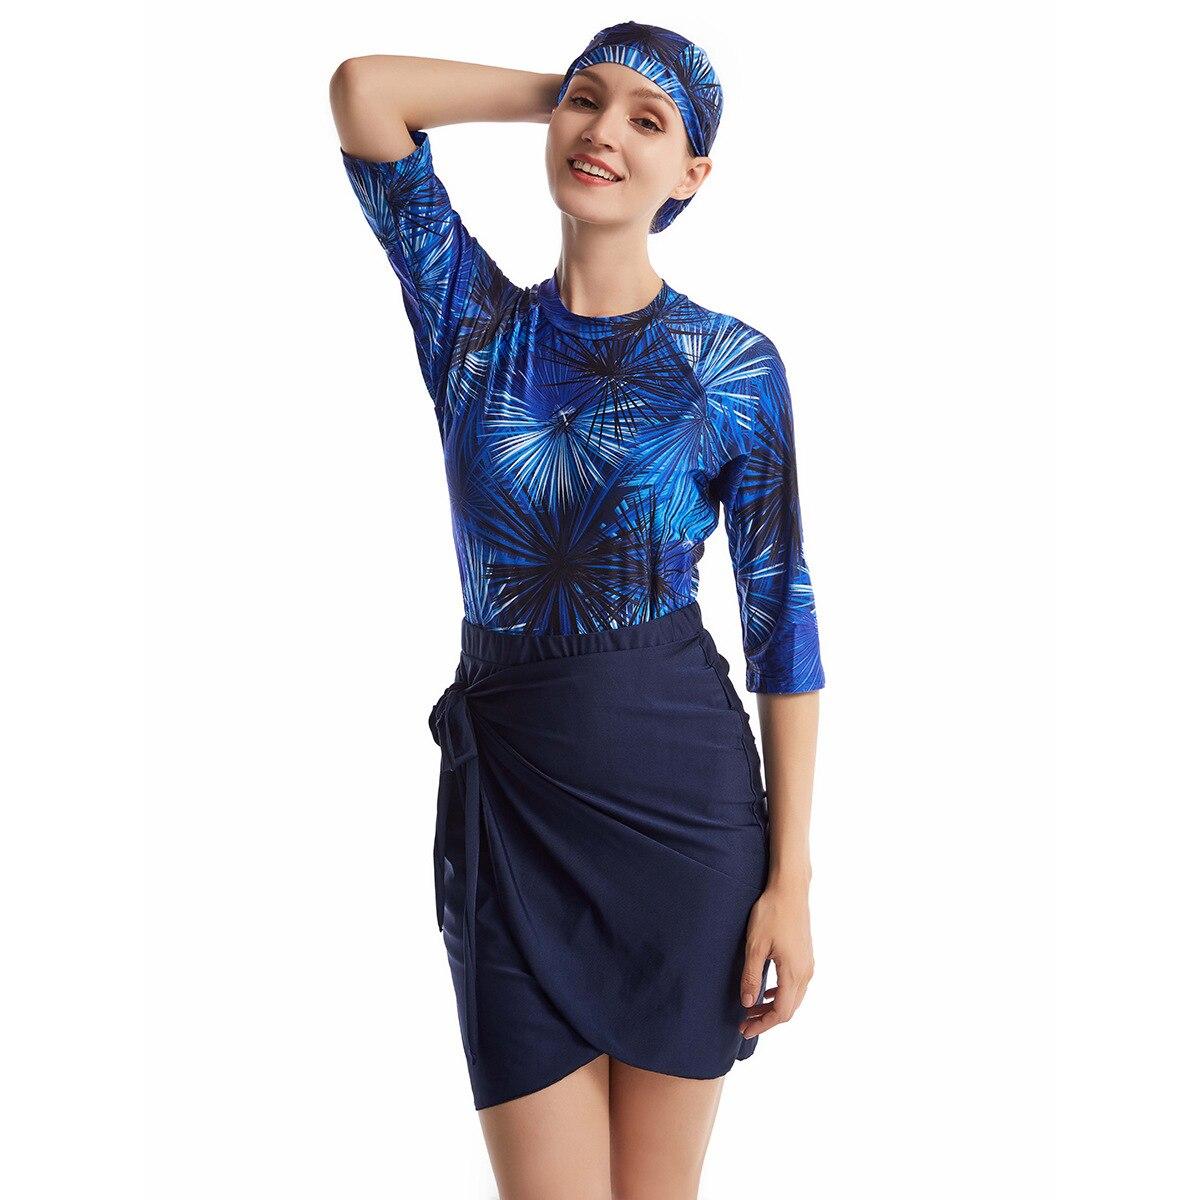 Frauen Rashguard Bademode Body + Rock + Kappe navy blue 1.jpg